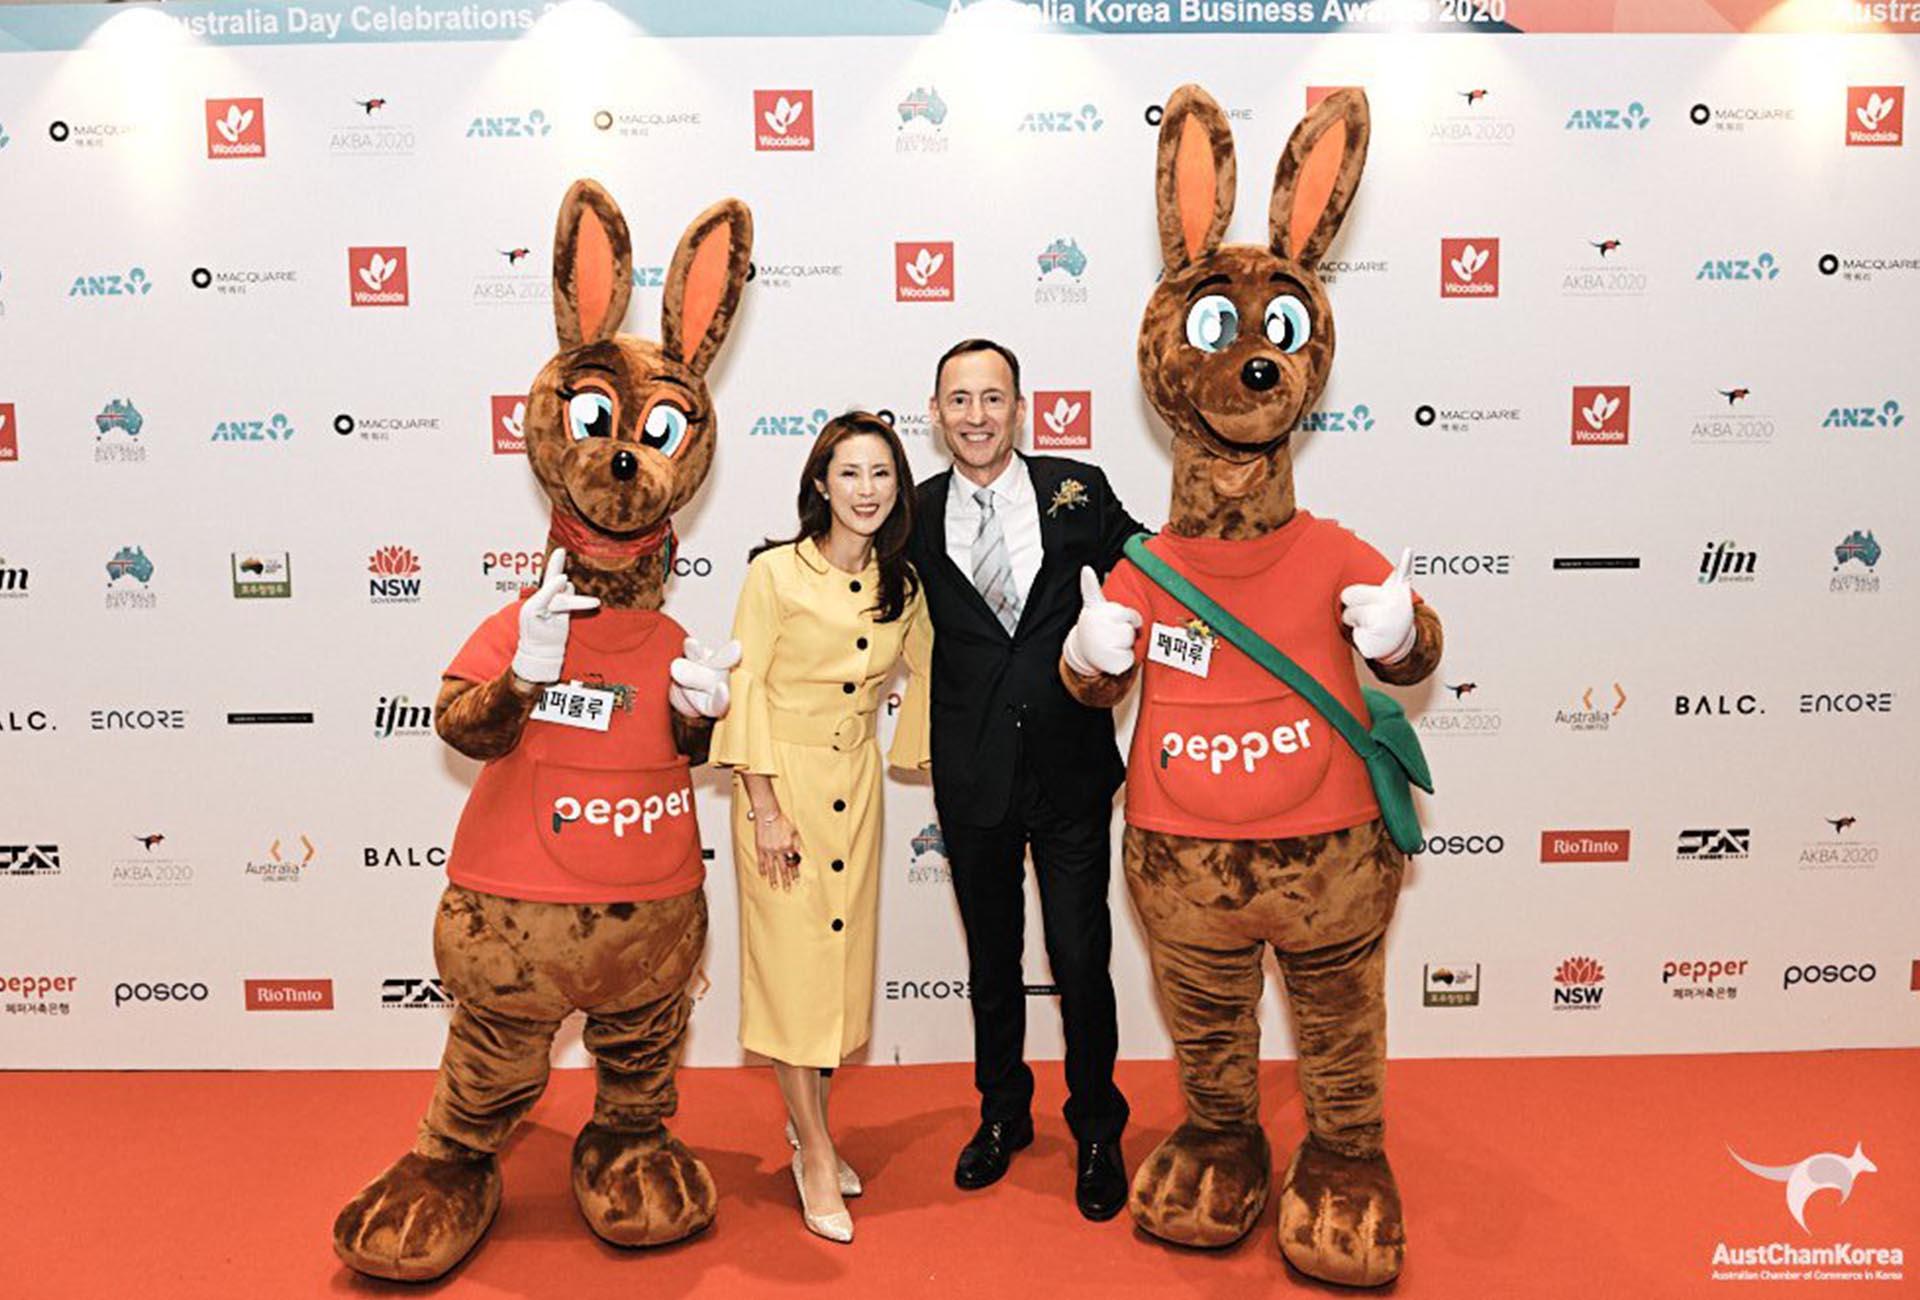 Media Wall Australia Korea Business Awards 2020